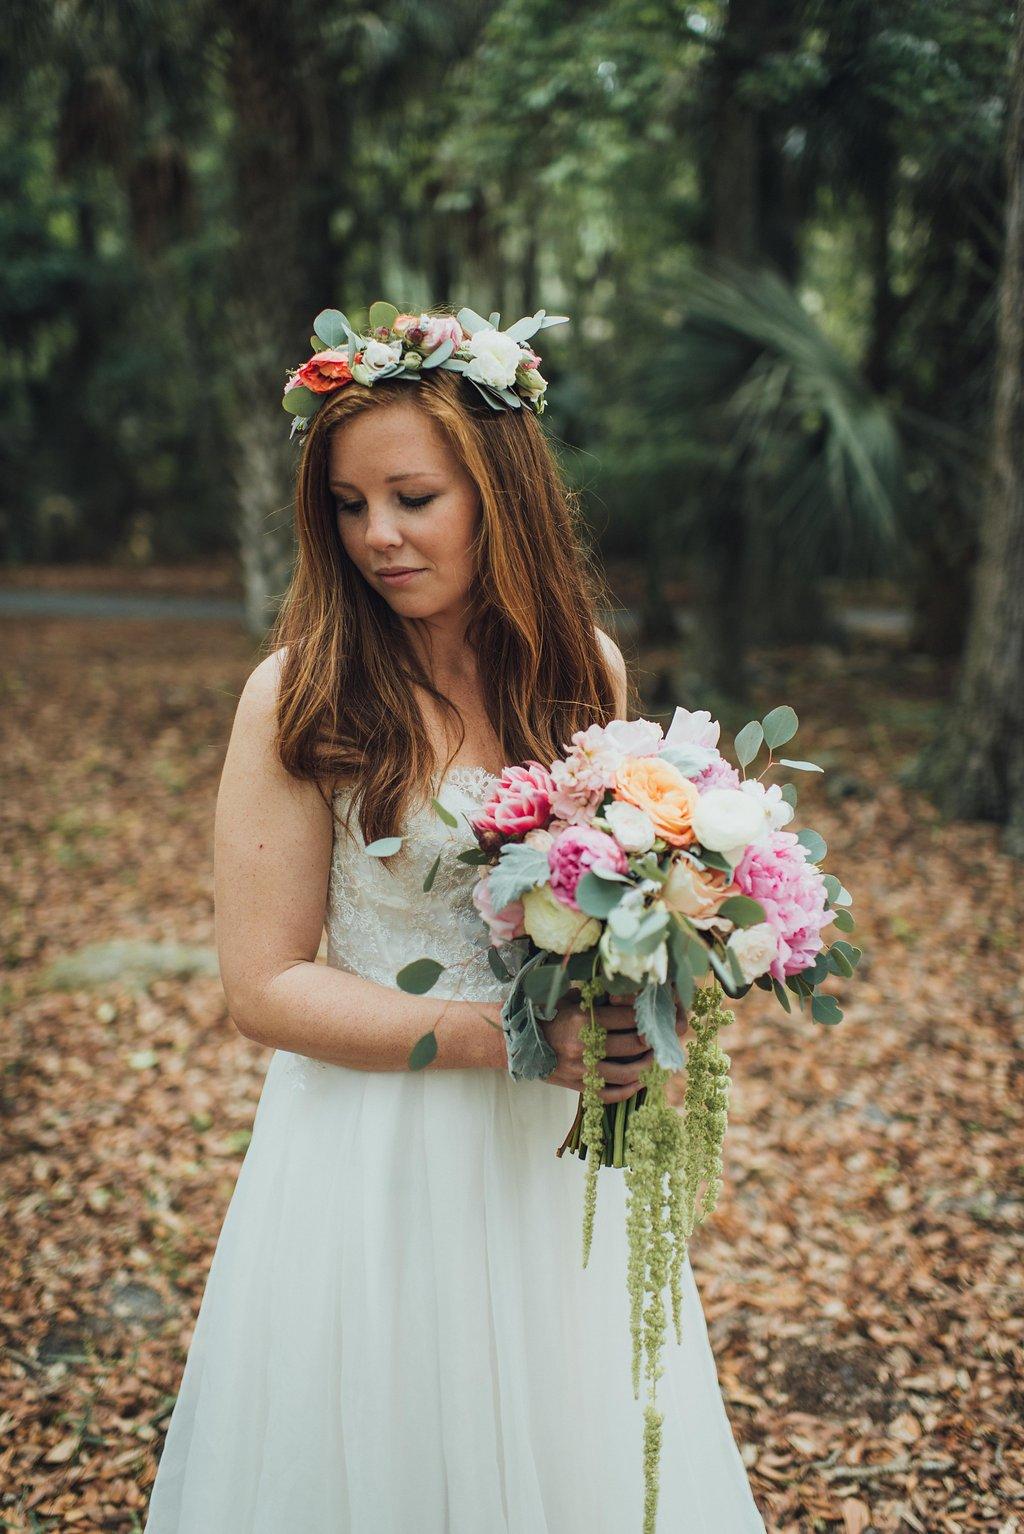 Urban-Poppy-Southern-Wedding-Mallory-and-Justin-photography-ivory-and-beau-bridal-boutique-sarah-seven-marion-boho-bride-indie-bride-indie-wedding-dress-savannah-weddings-hilton-head-weddings-beach-wedding-3.jpg